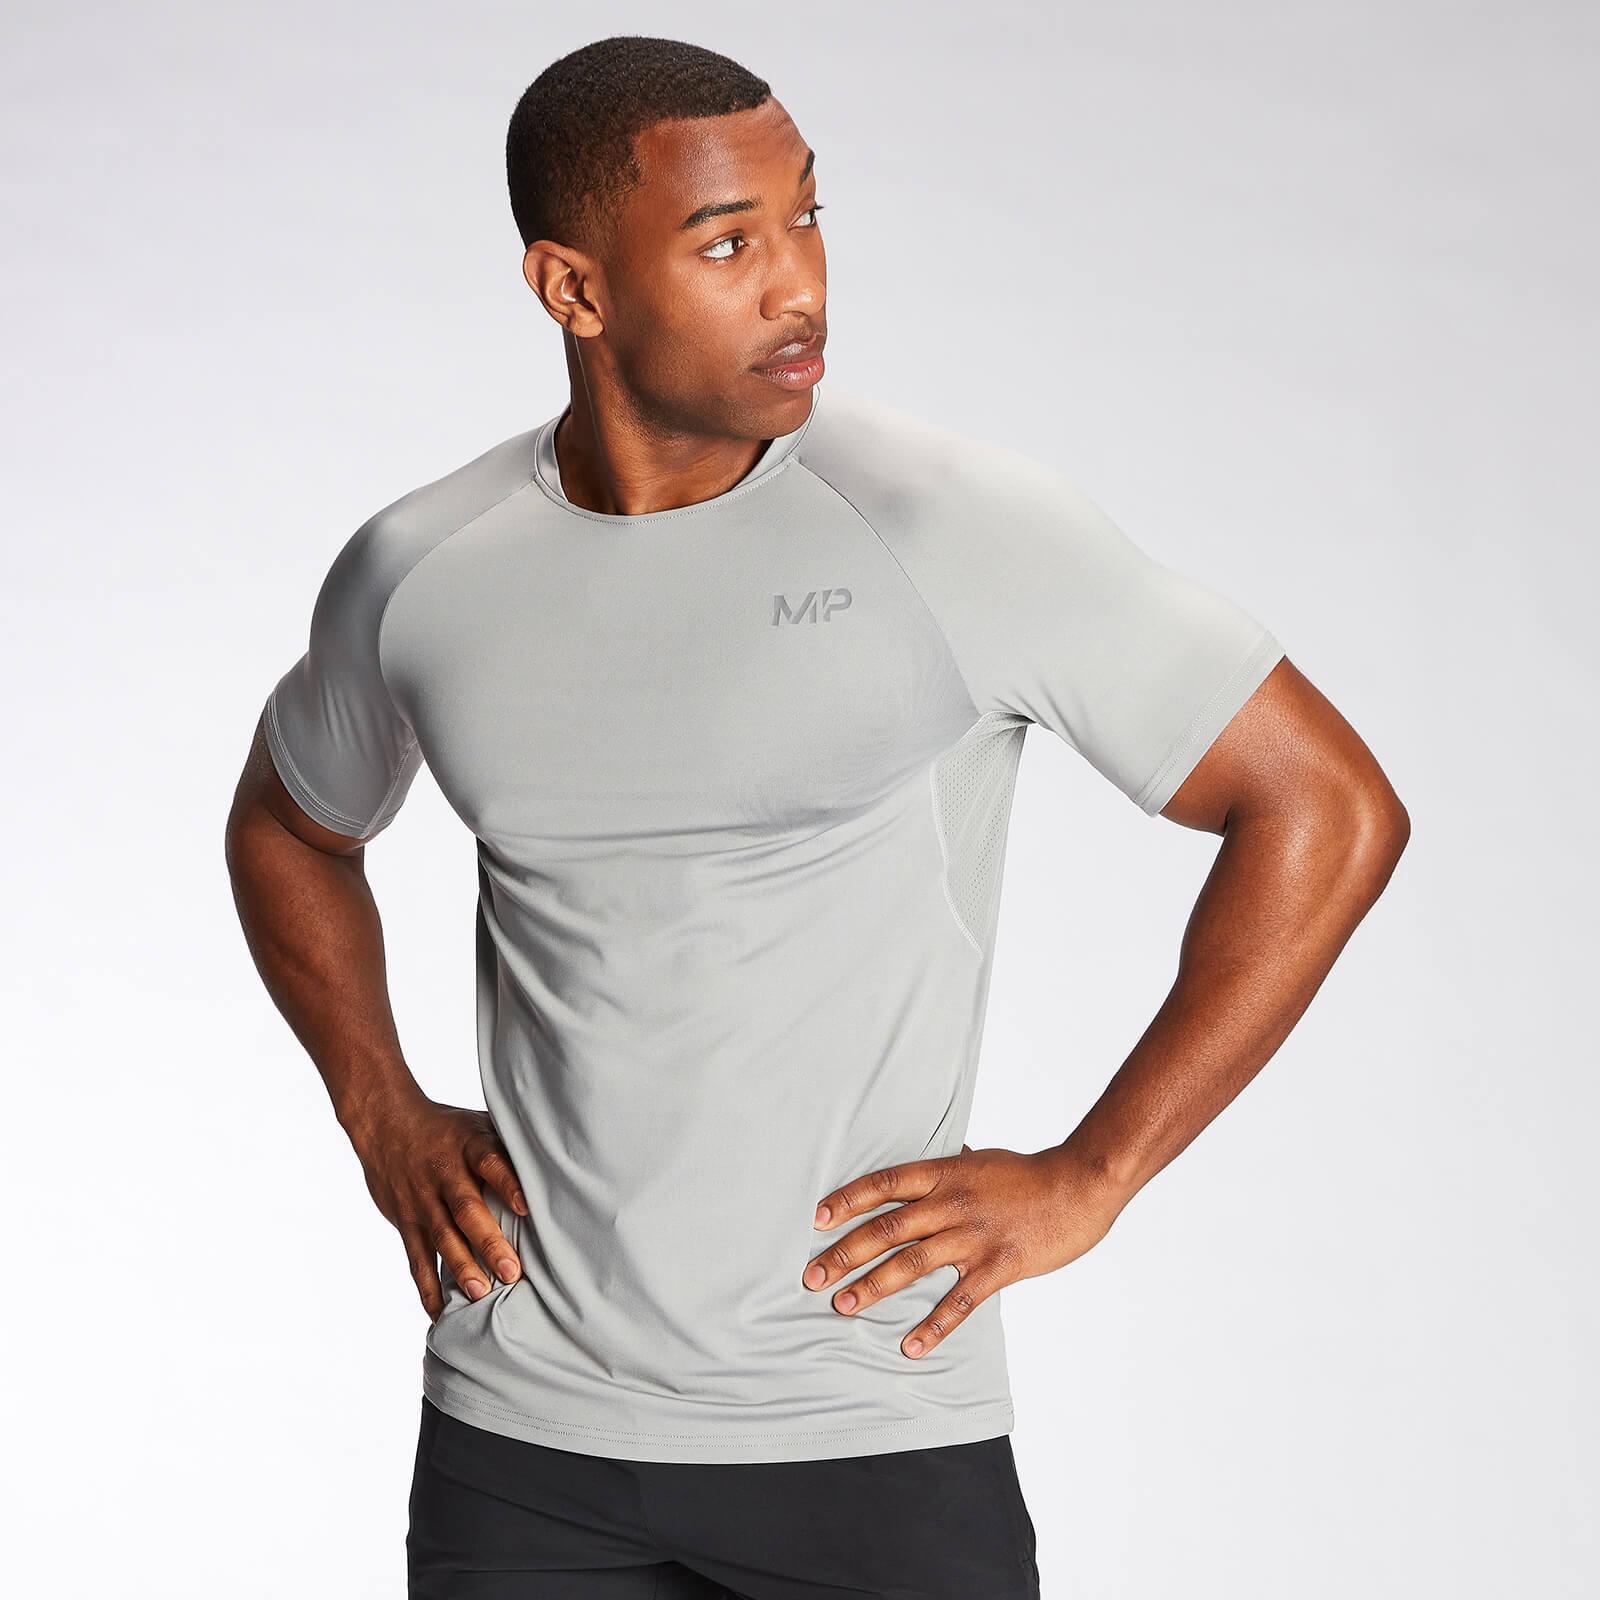 Купить MP Men's Agility Short Sleeve T-Shirt - Storm - XXL, Myprotein International